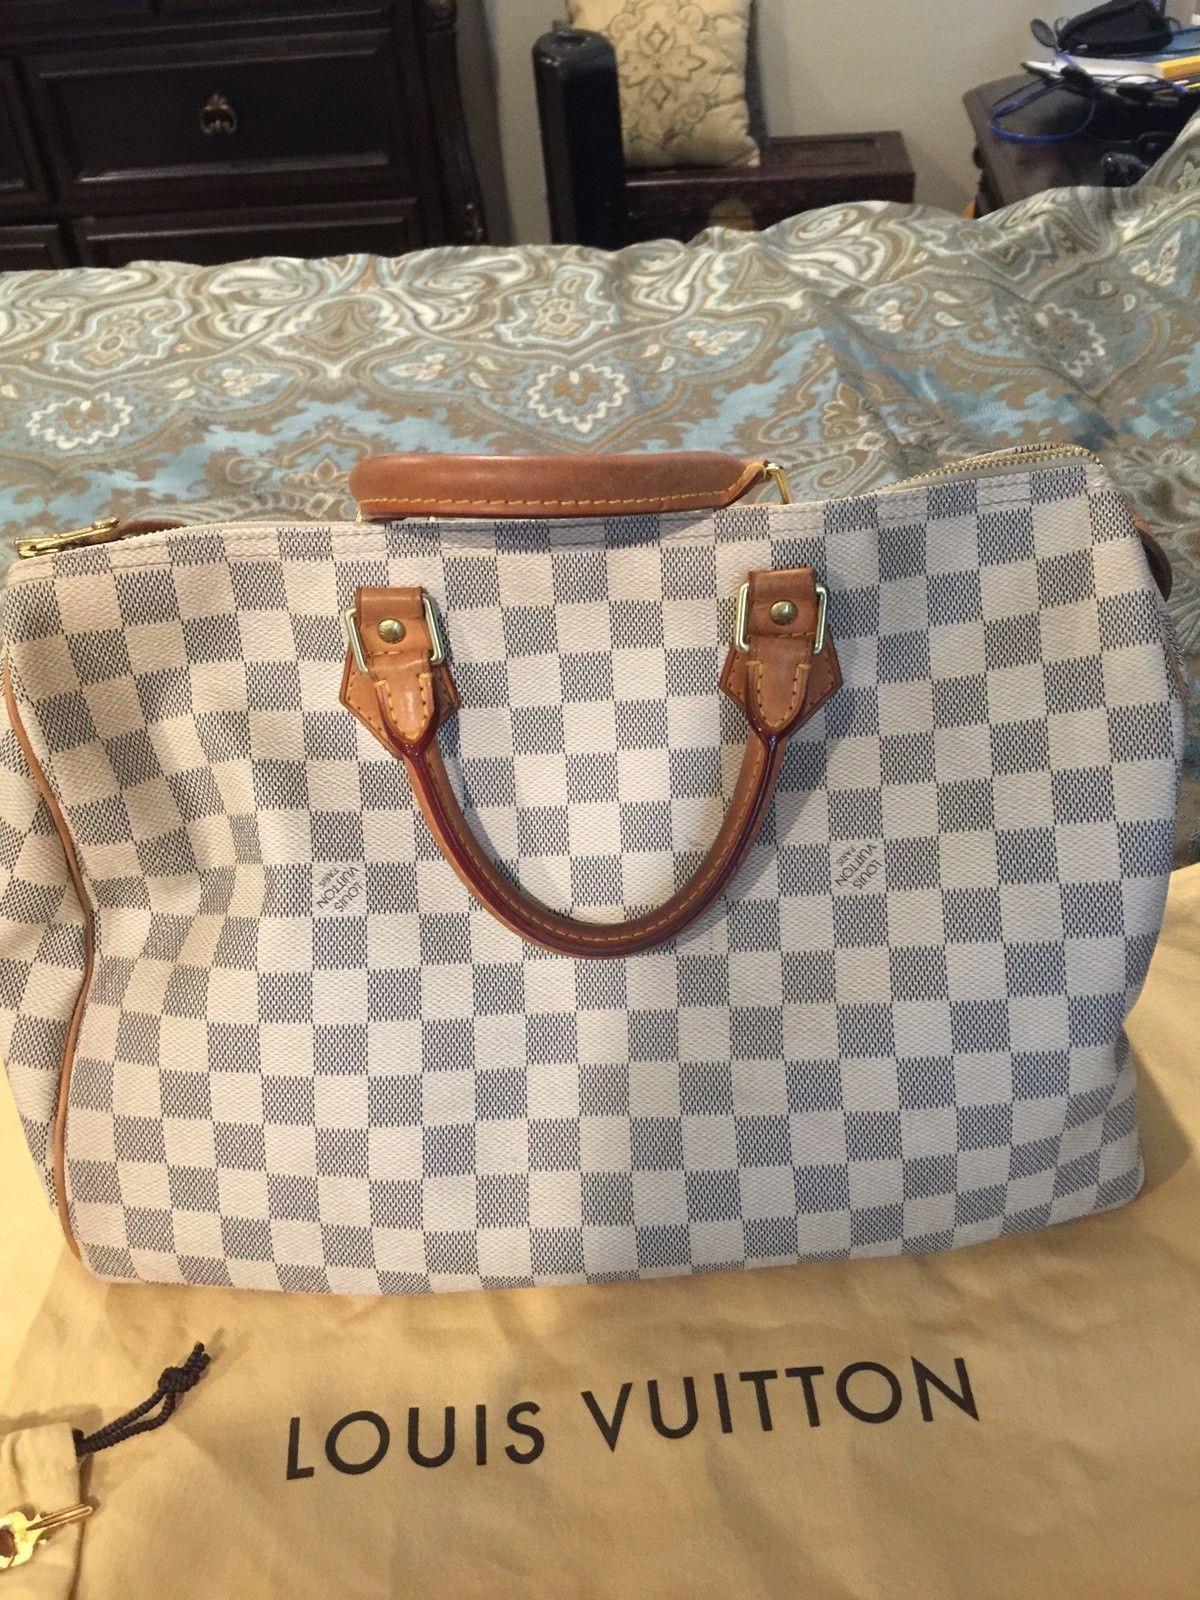 998ca0aaff066 Authentic Louis Vuitton Damier Azur Speedy 35  675.0